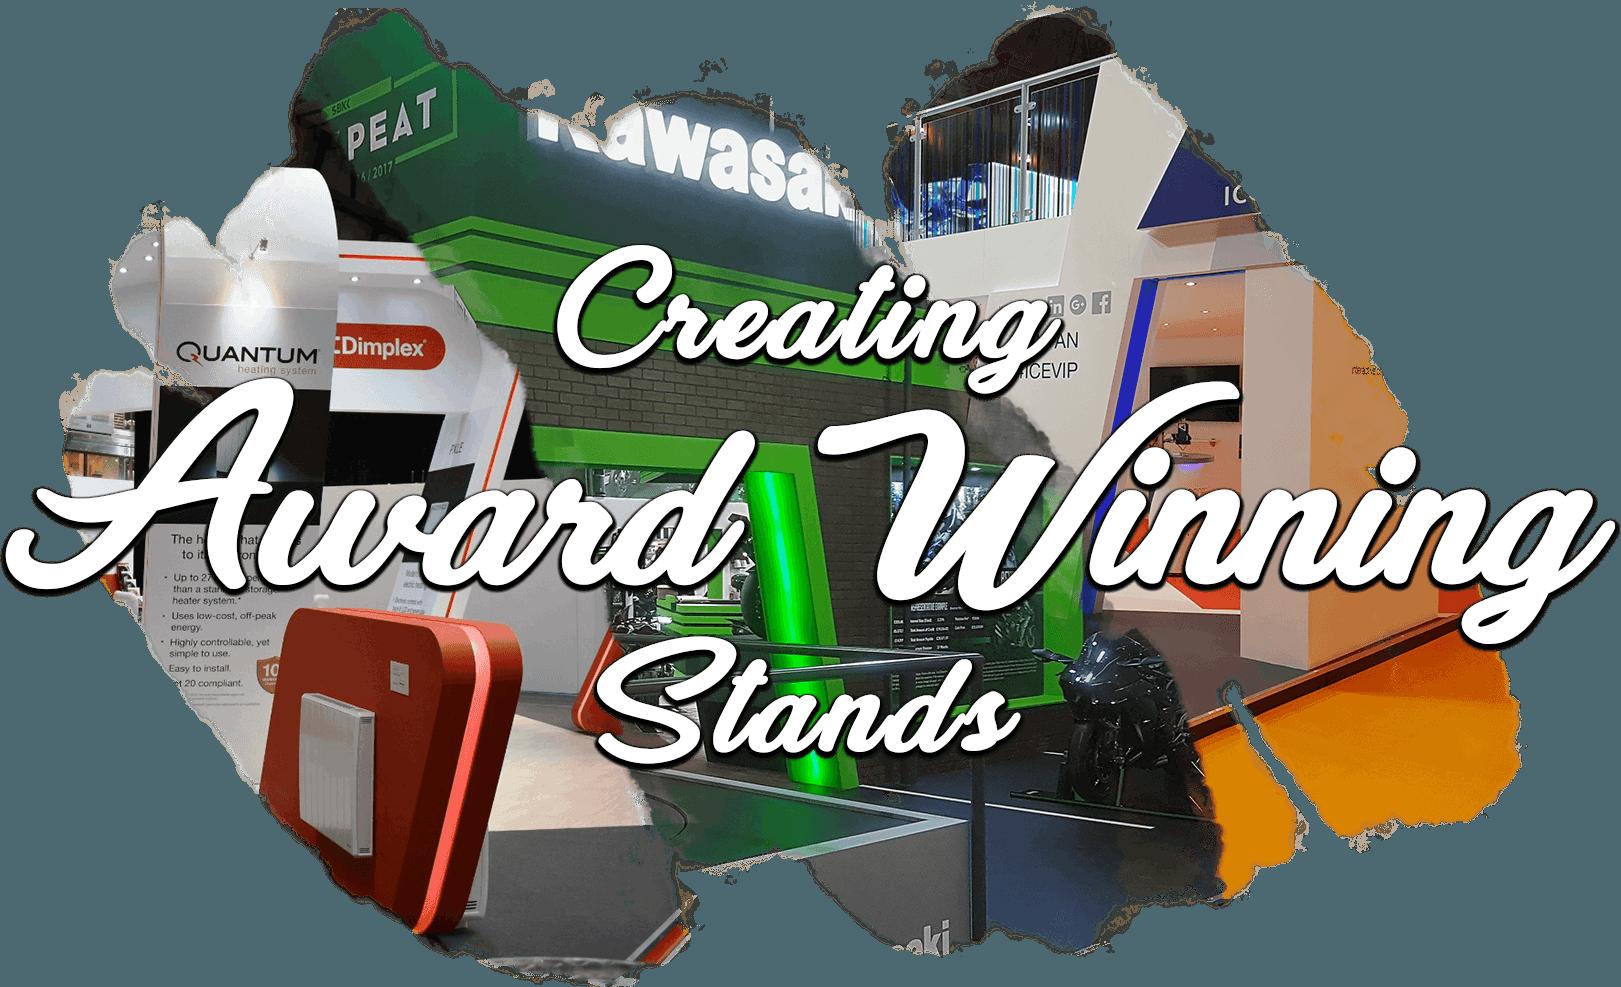 Award Winning Stand